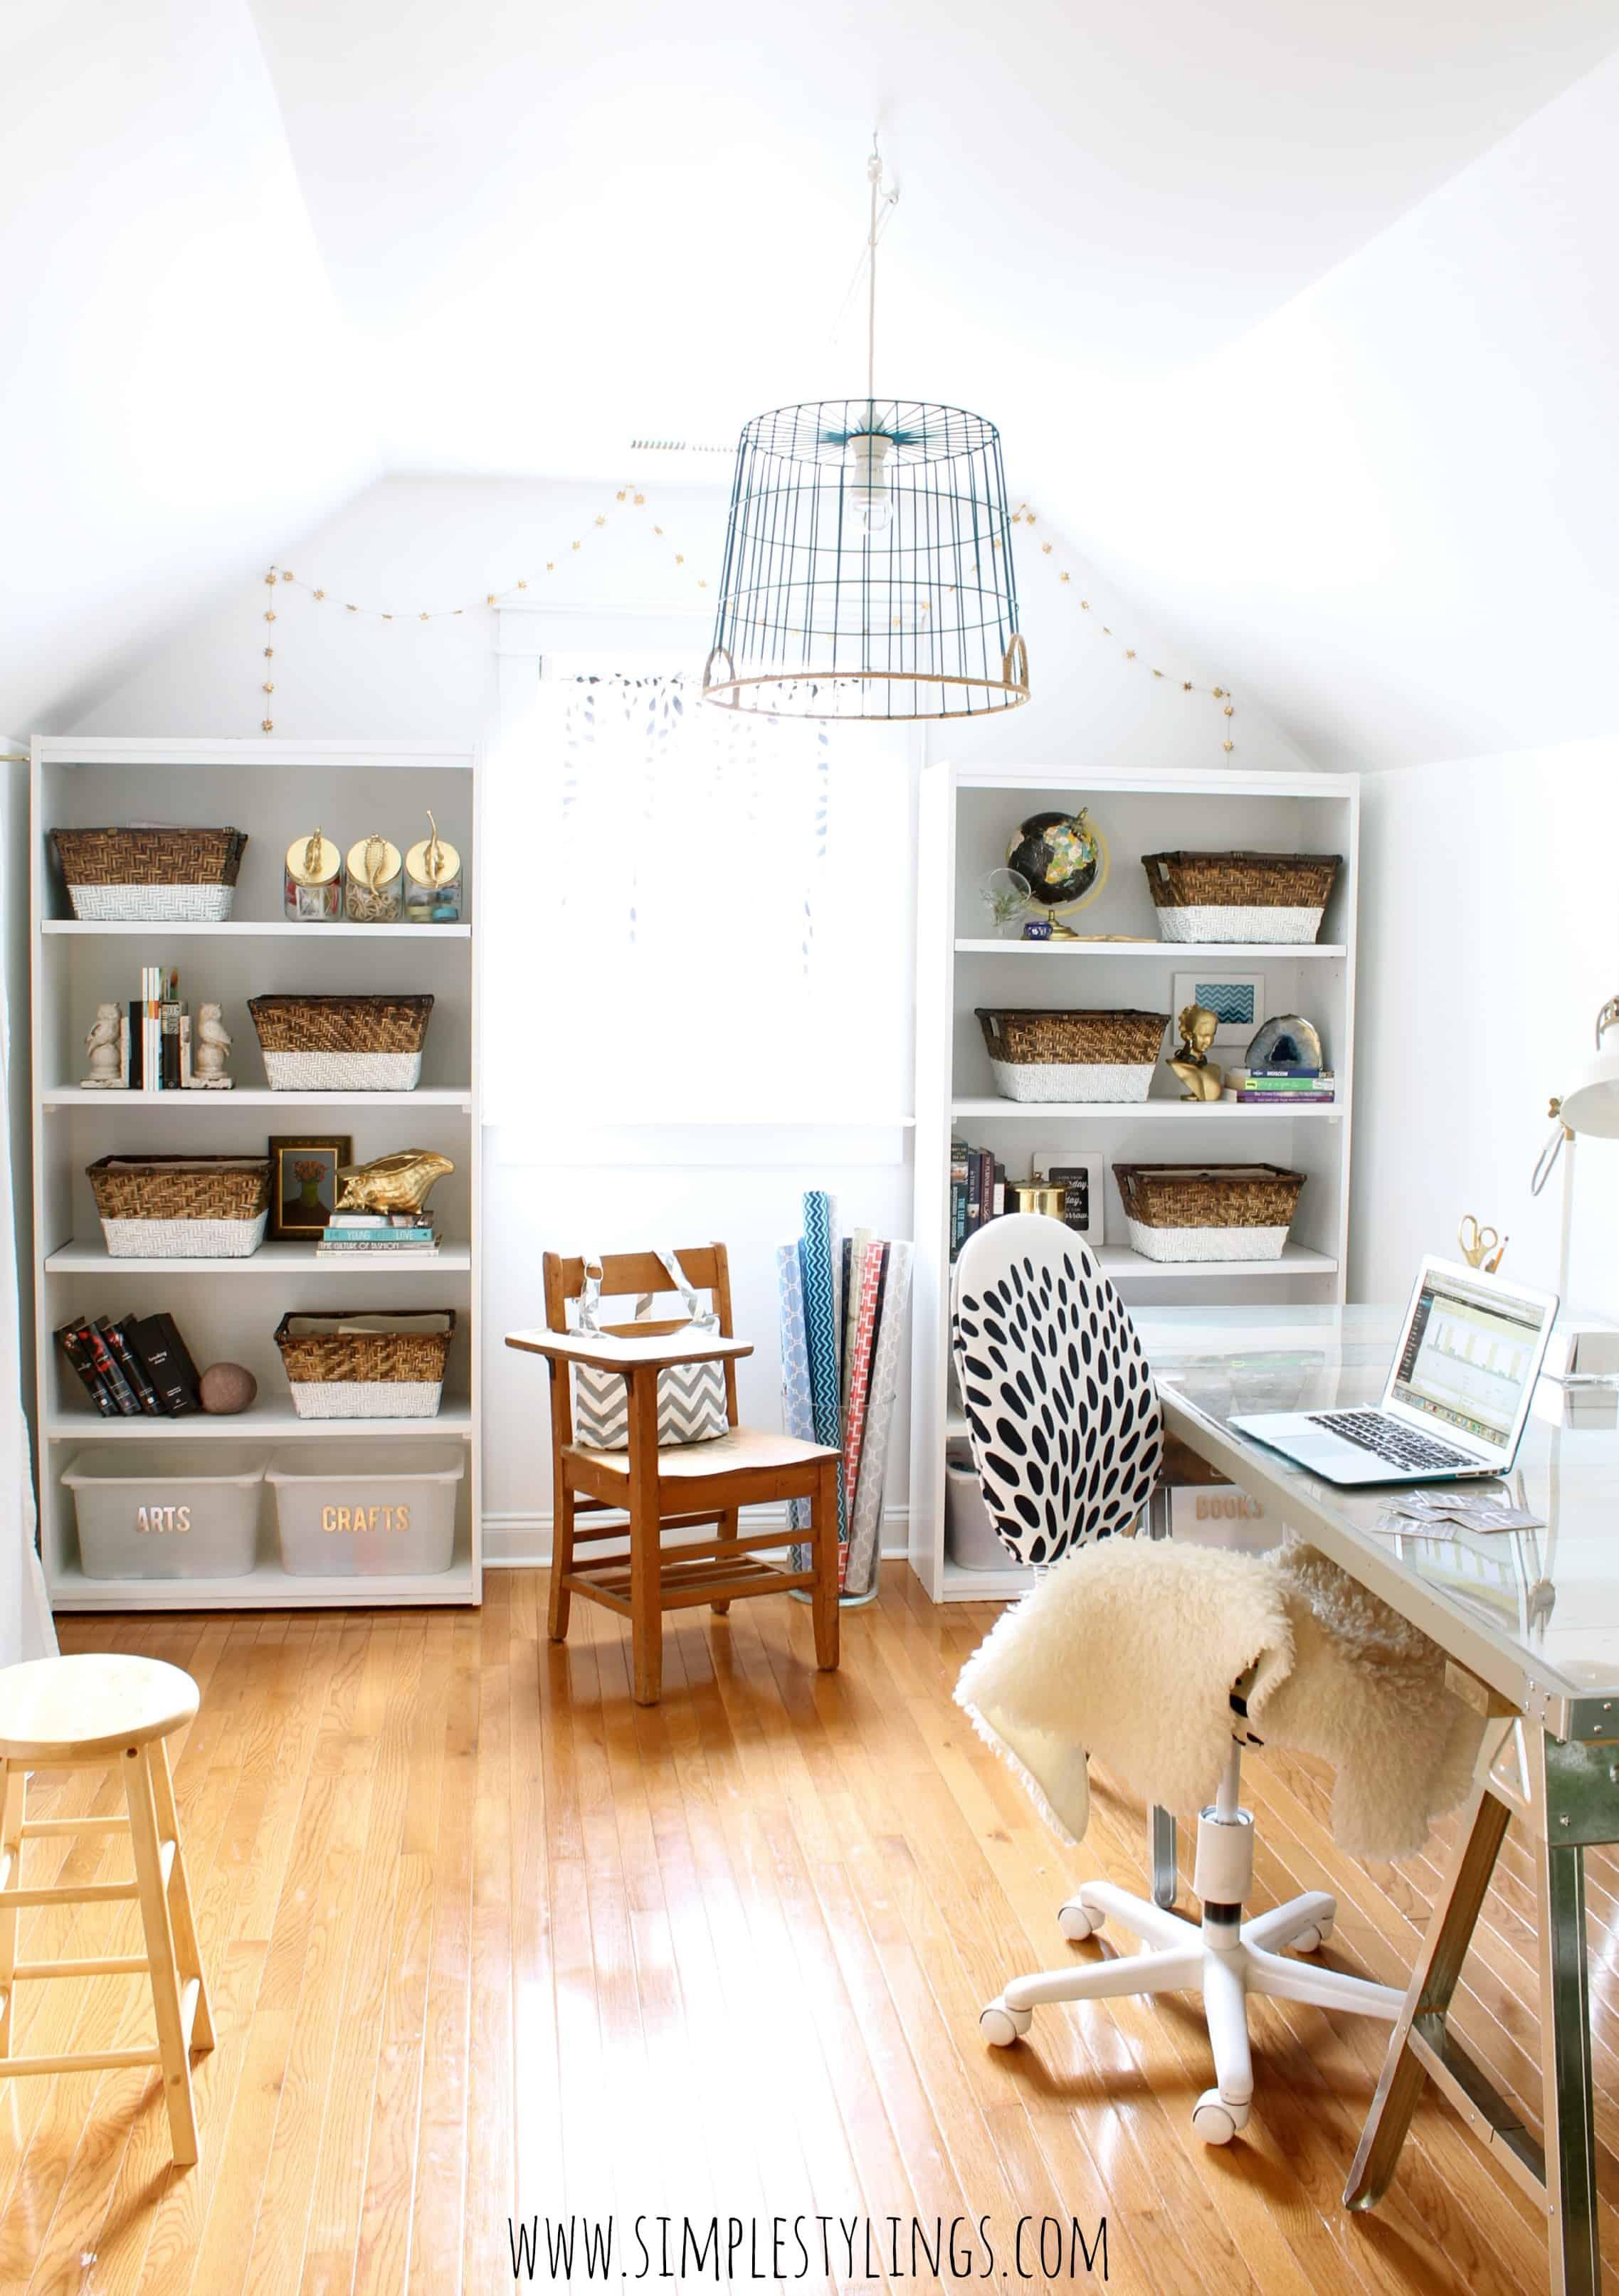 Diy faux demijohn bottle simple stylings for Simple home office ideas